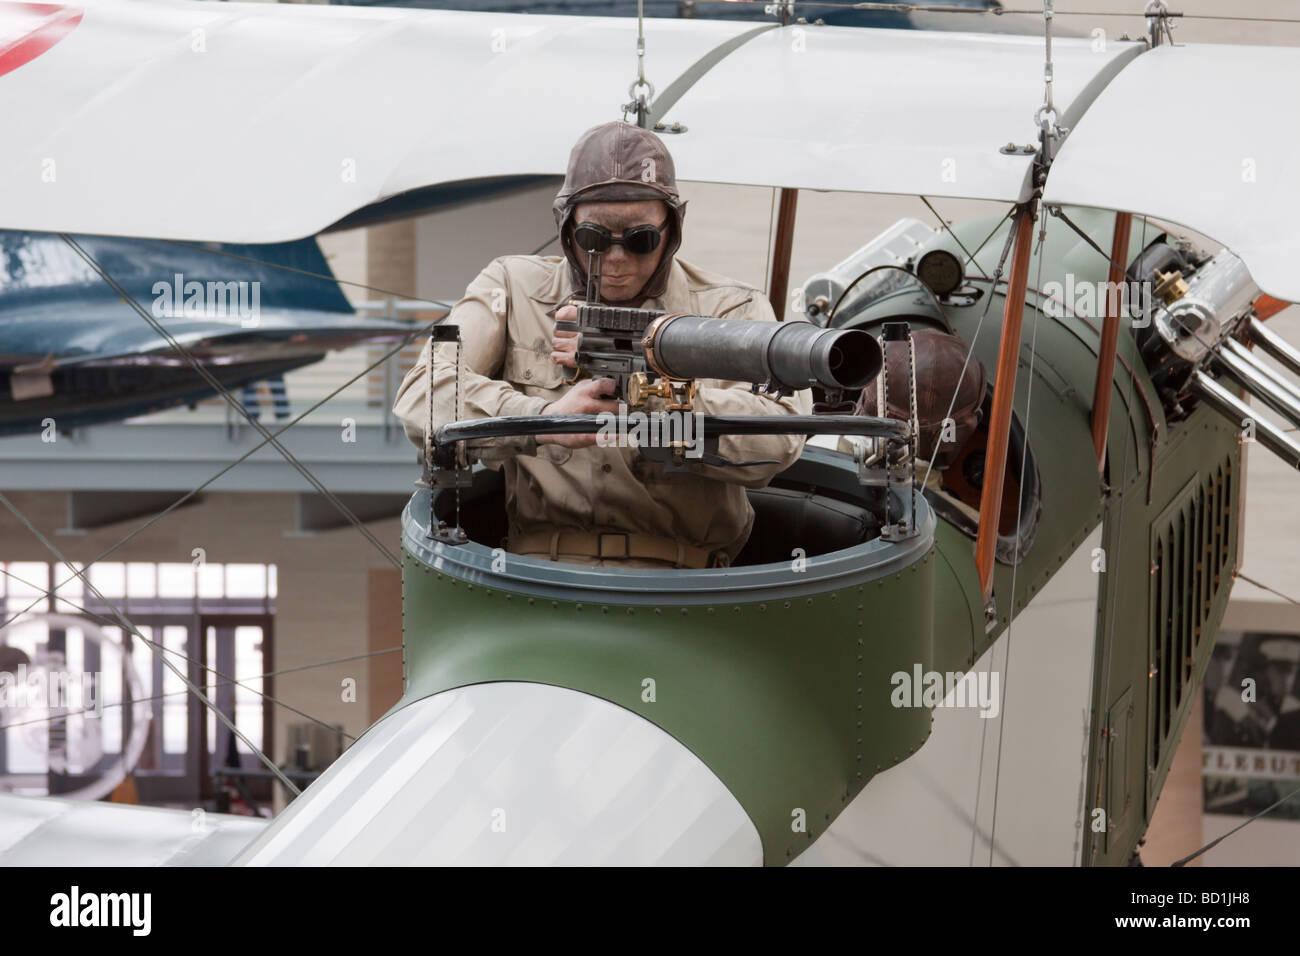 Aircraft exhibit at the US Marine Corps Museum, Quantico, Virginia, USA Stock Photo